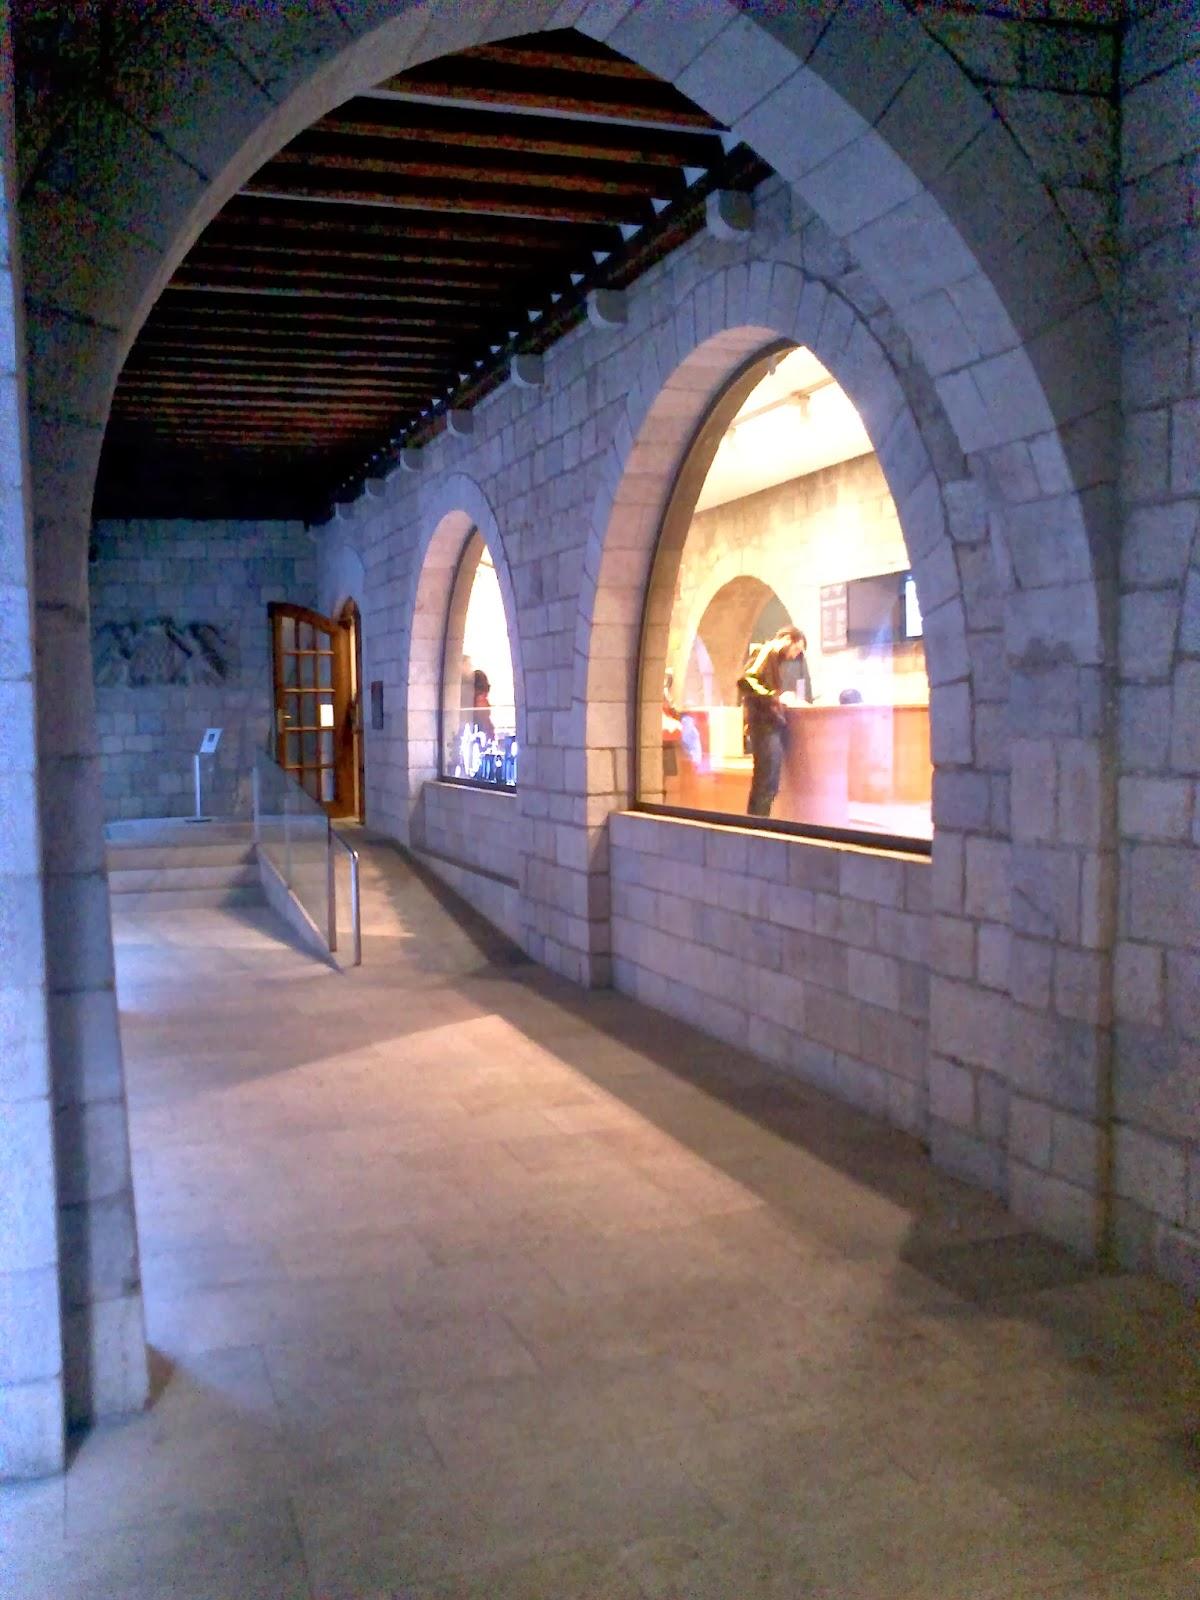 Fontana d'or. Encants de Girona